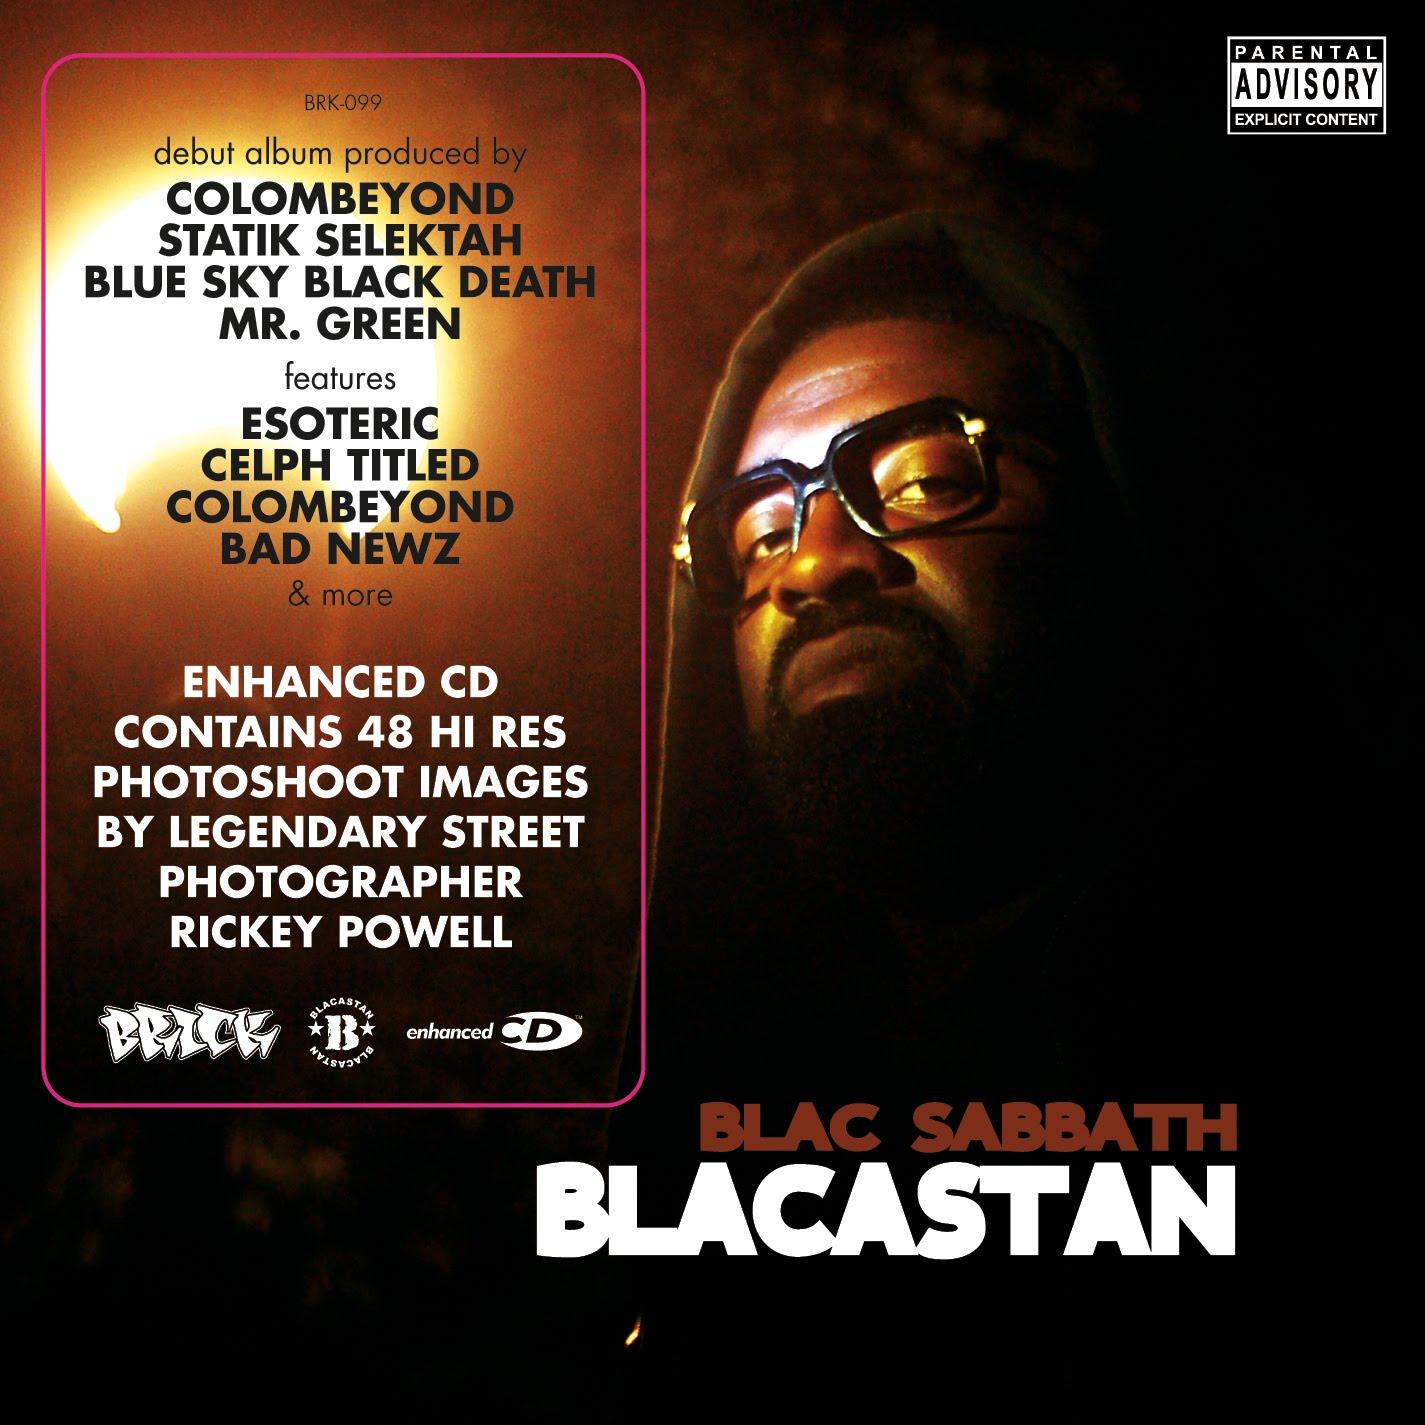 BEATBOX RADIO SHOW: Blacastan - The Dice Life (Plus Blac Sabbath